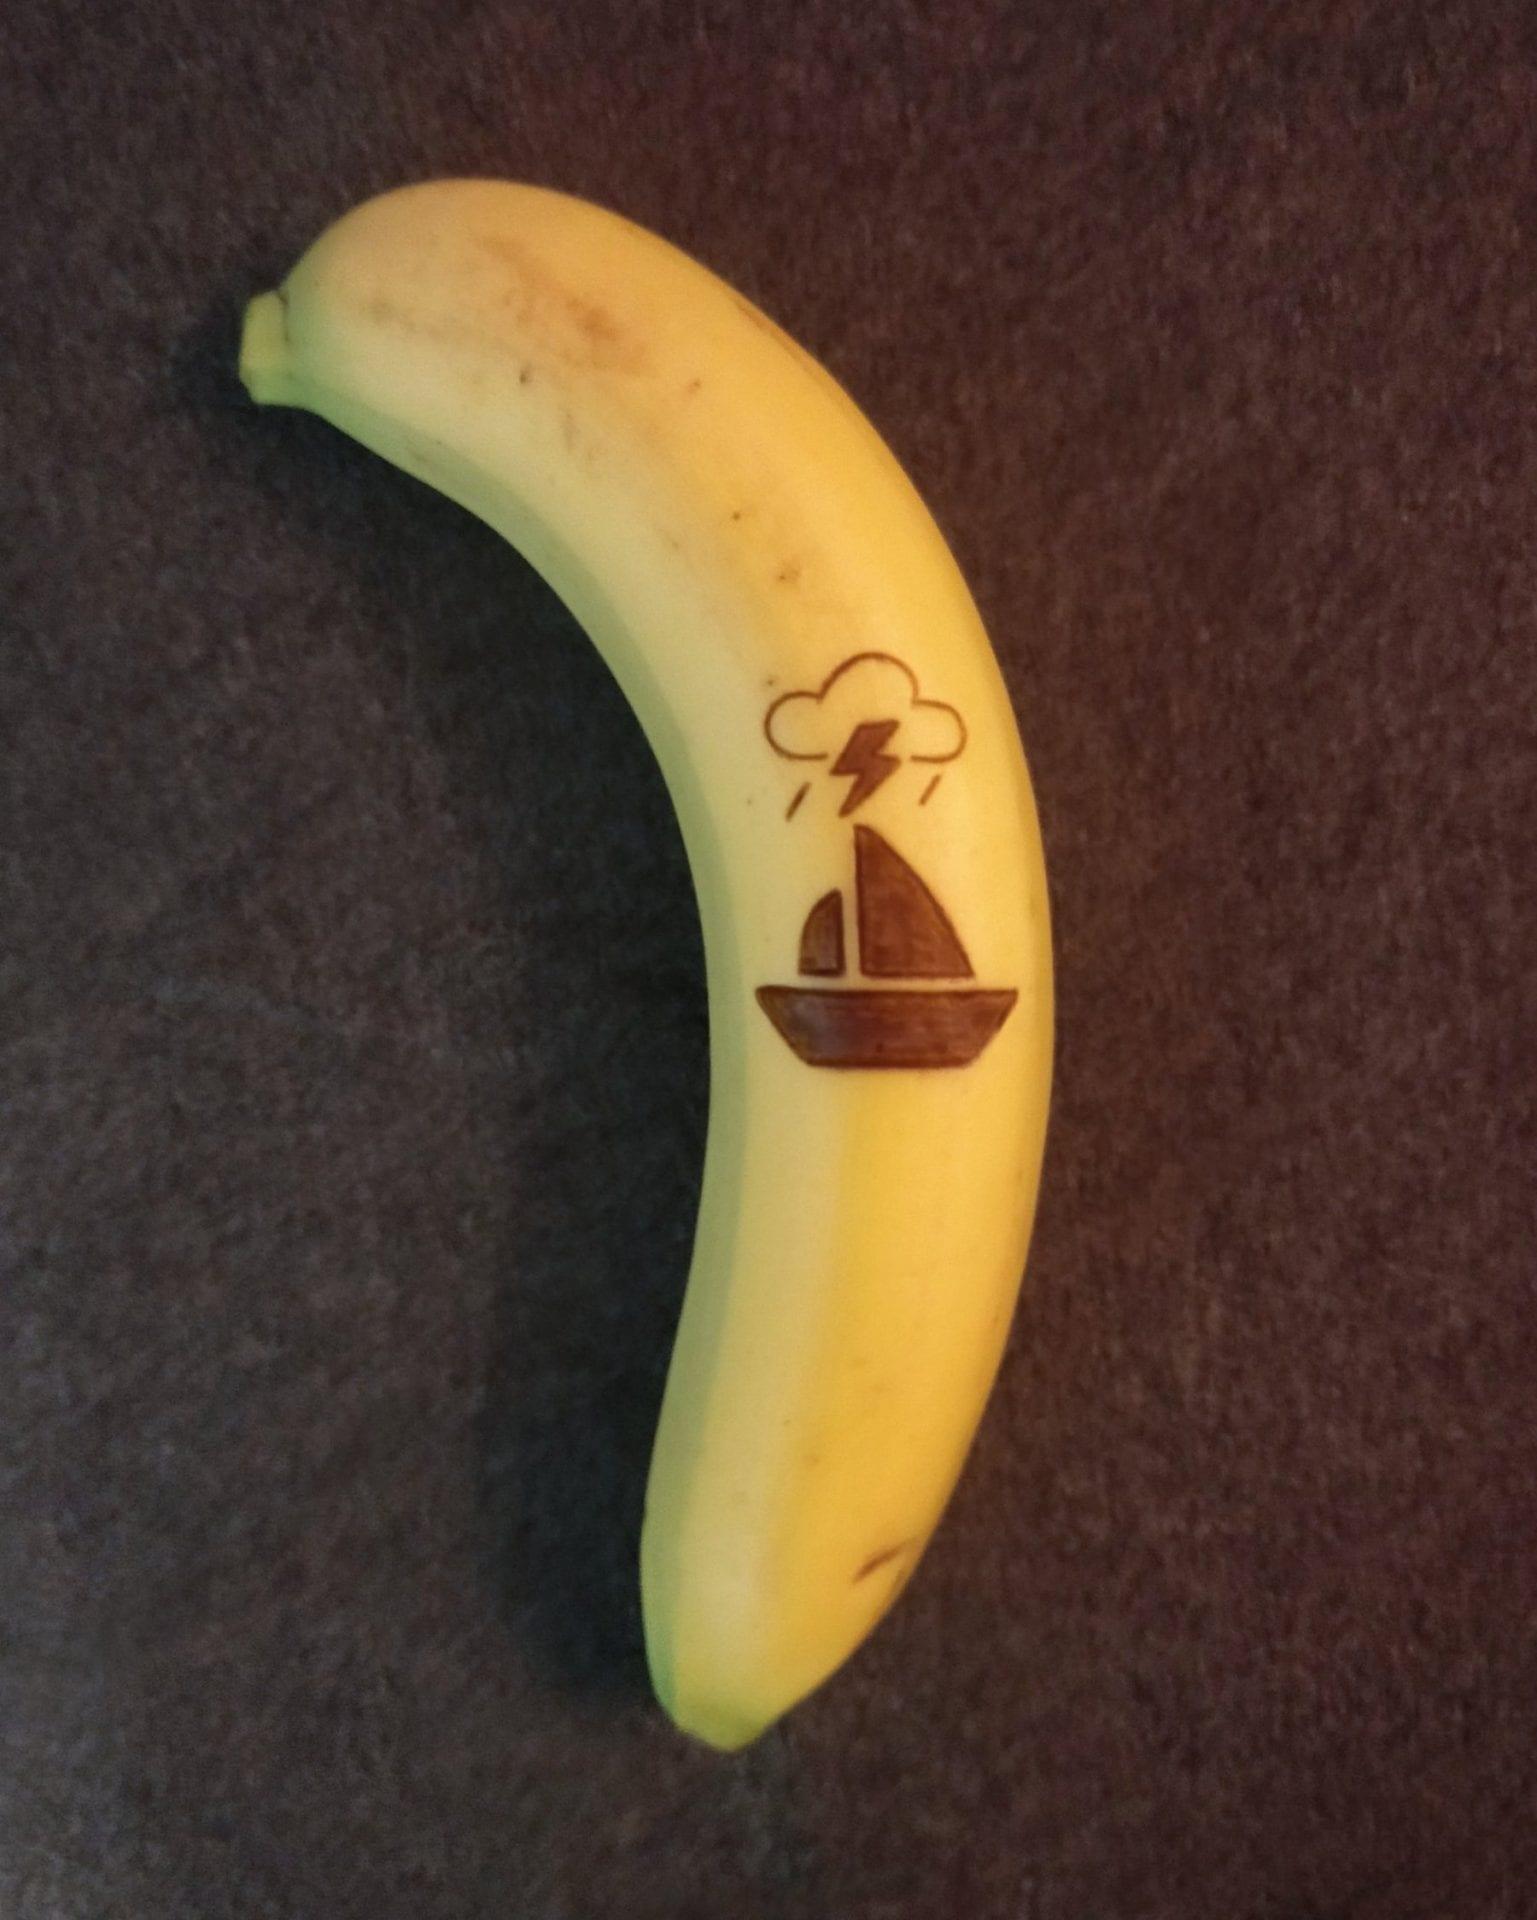 L'artiste Anna Chojnicka dessine sur des bananes sans utiliser d'encre